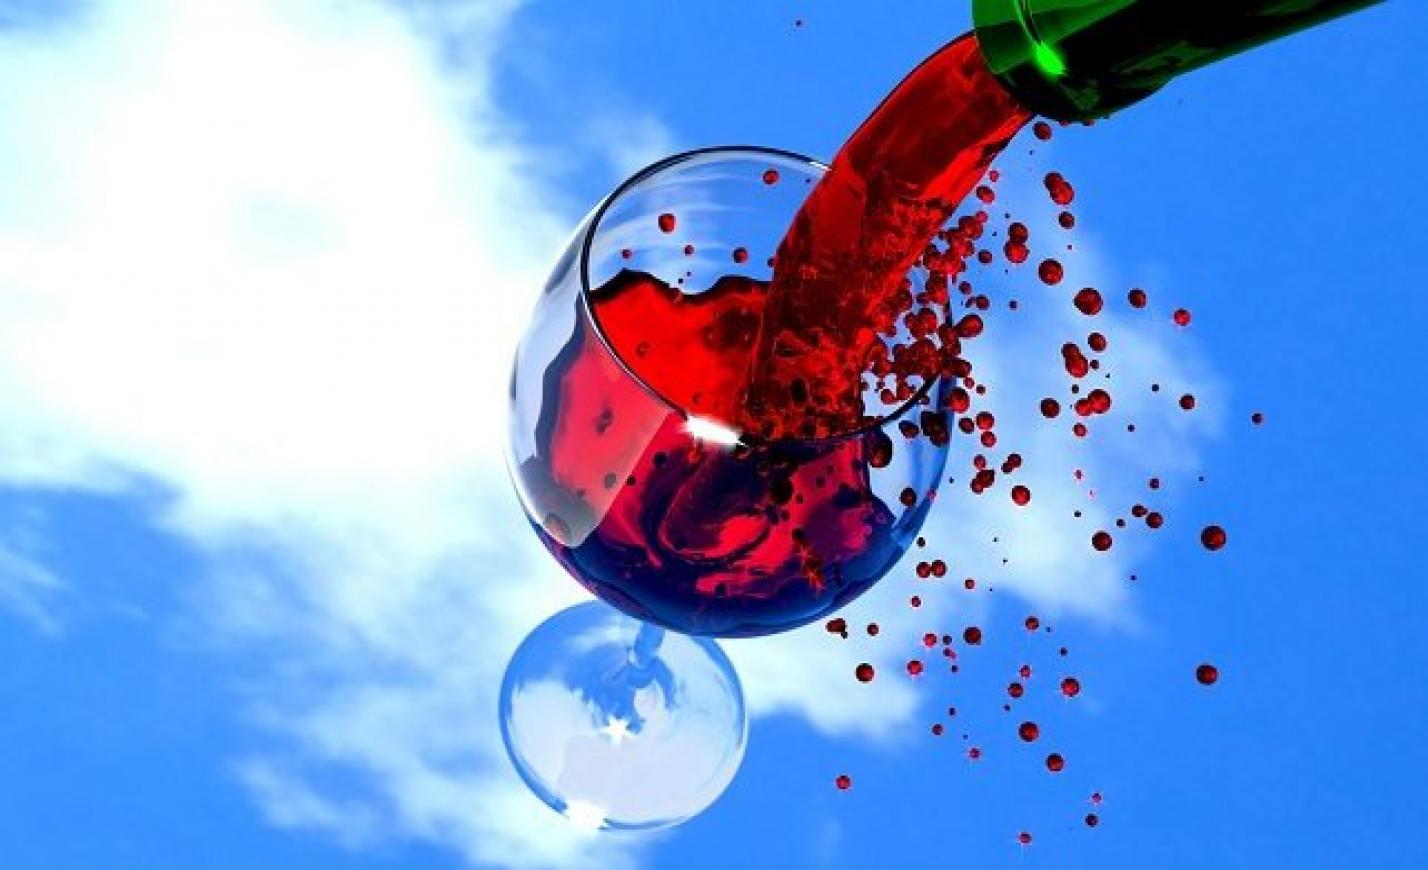 Bormedence 2017: Kárpát-medencei borok kóstolója Budapesten